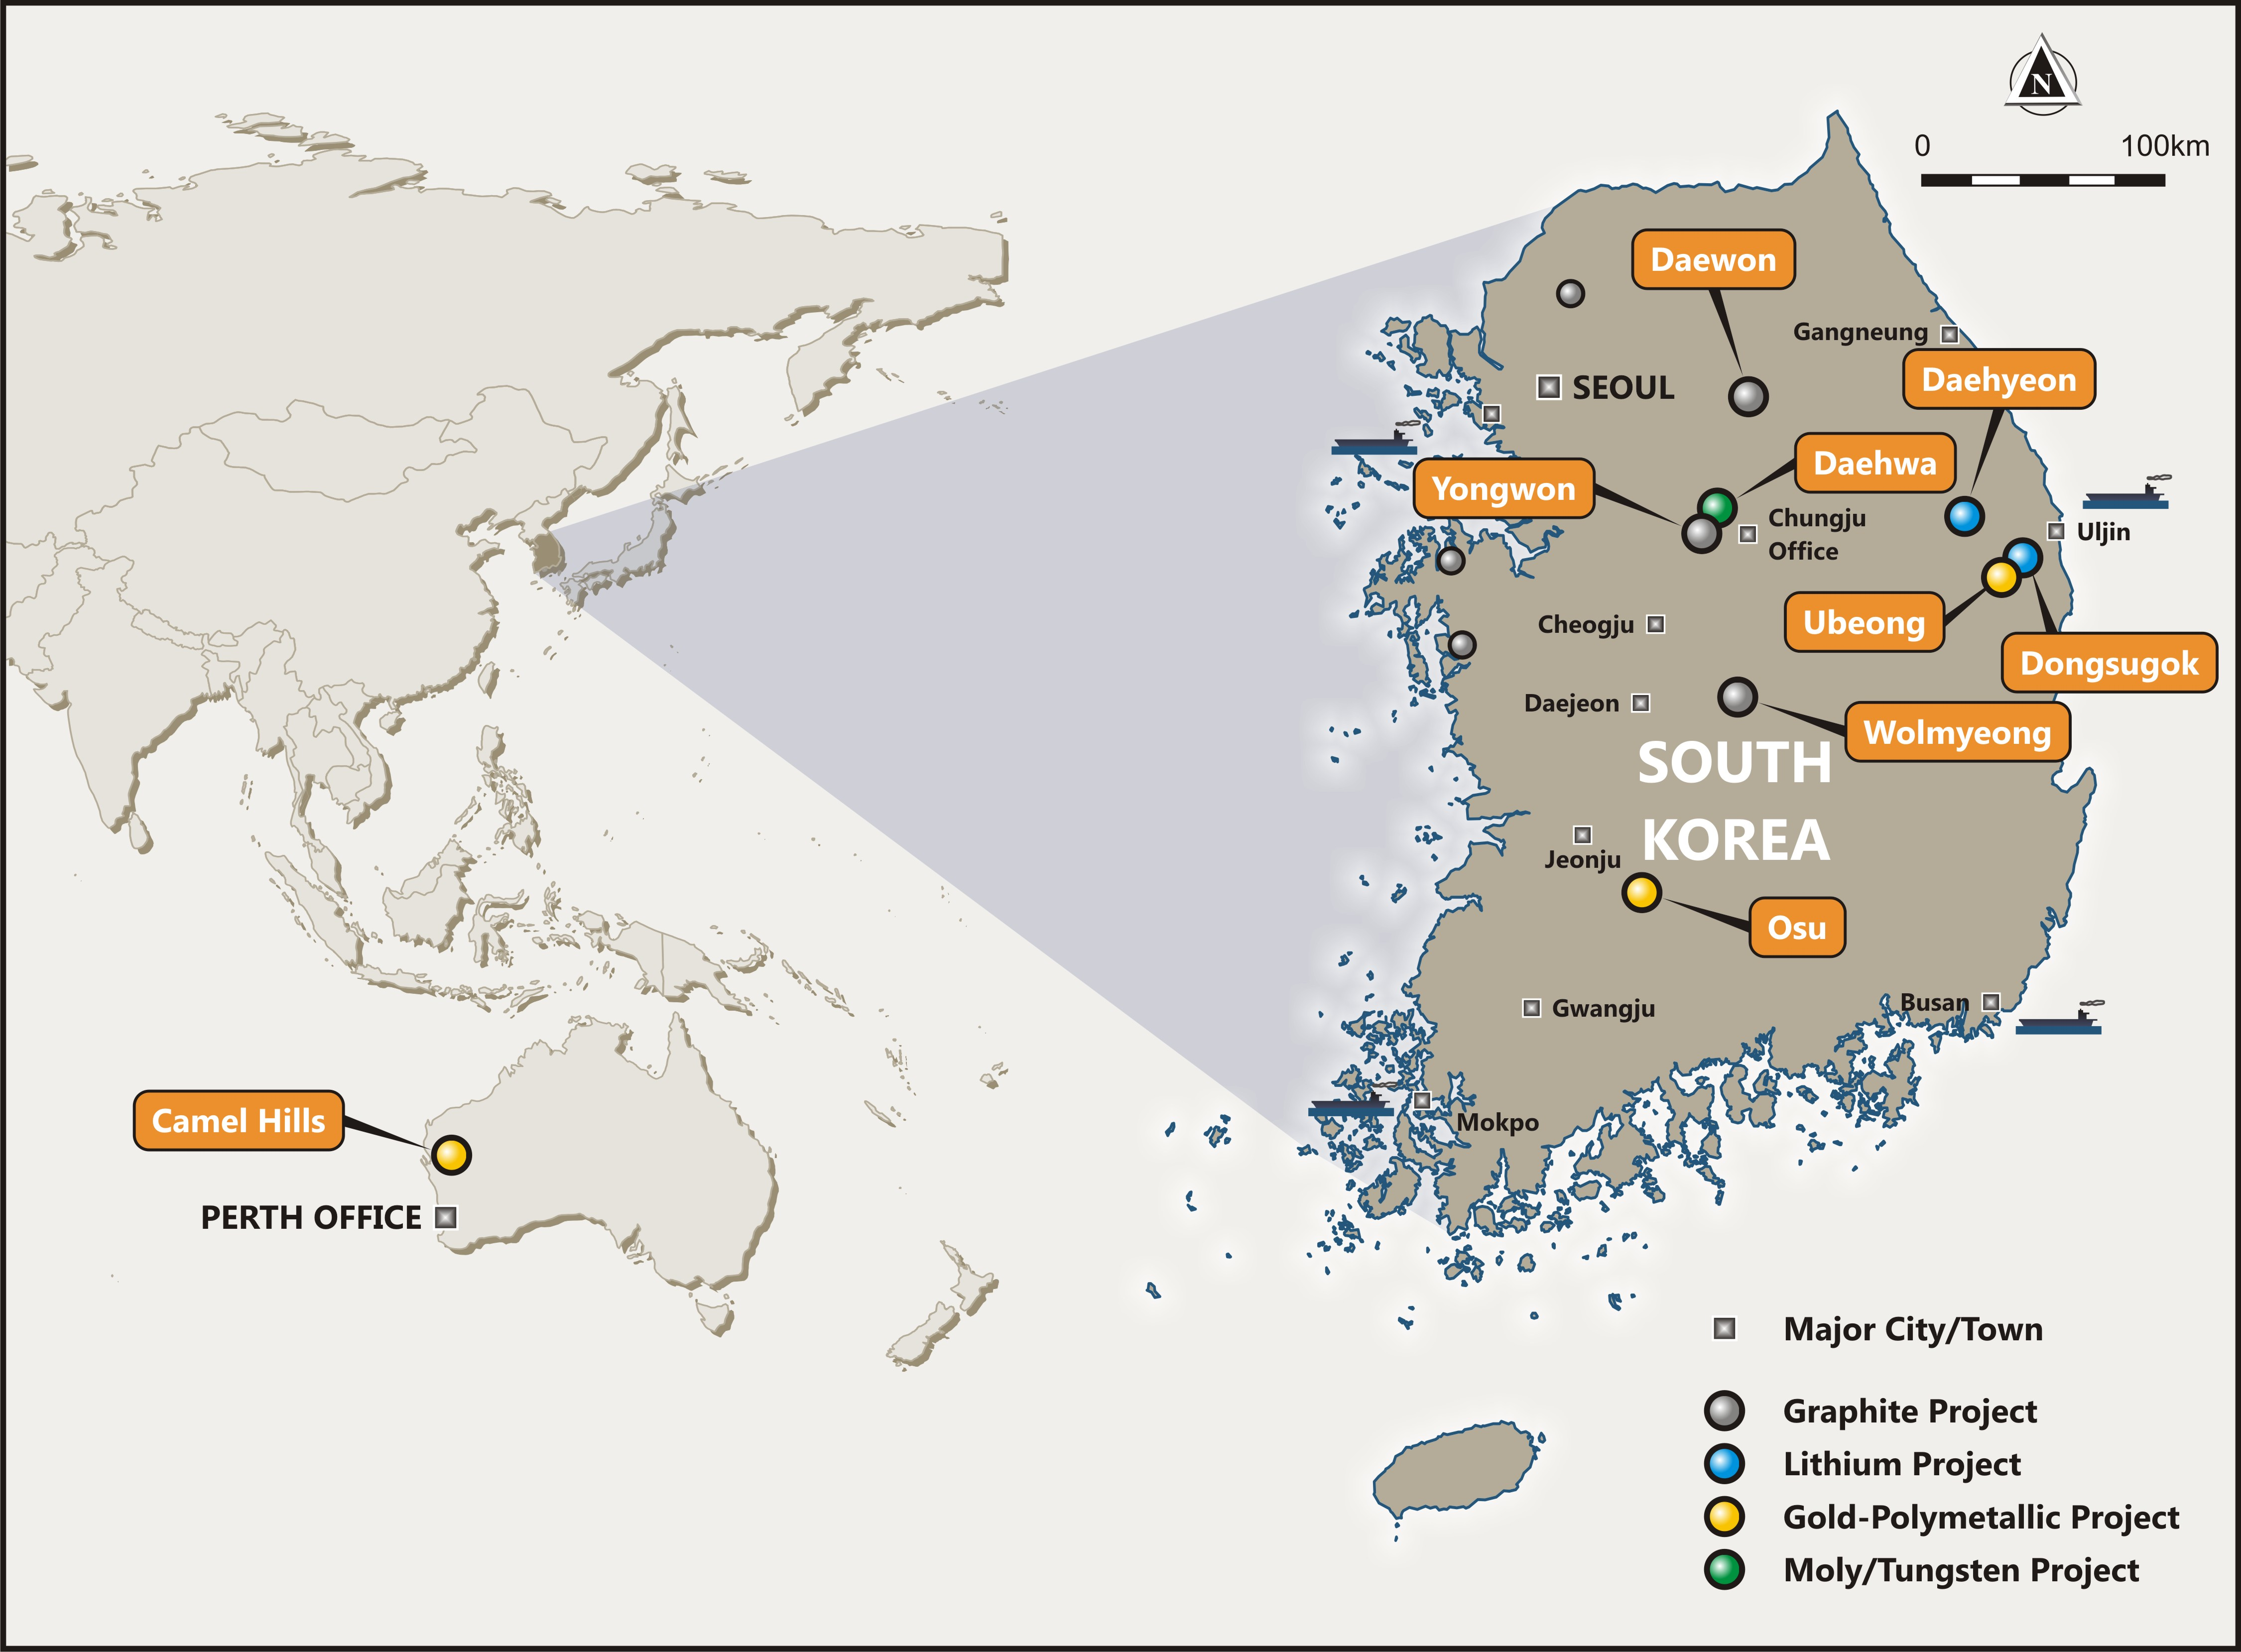 Peninsula raises $1.6m to fund development of South Korean projects